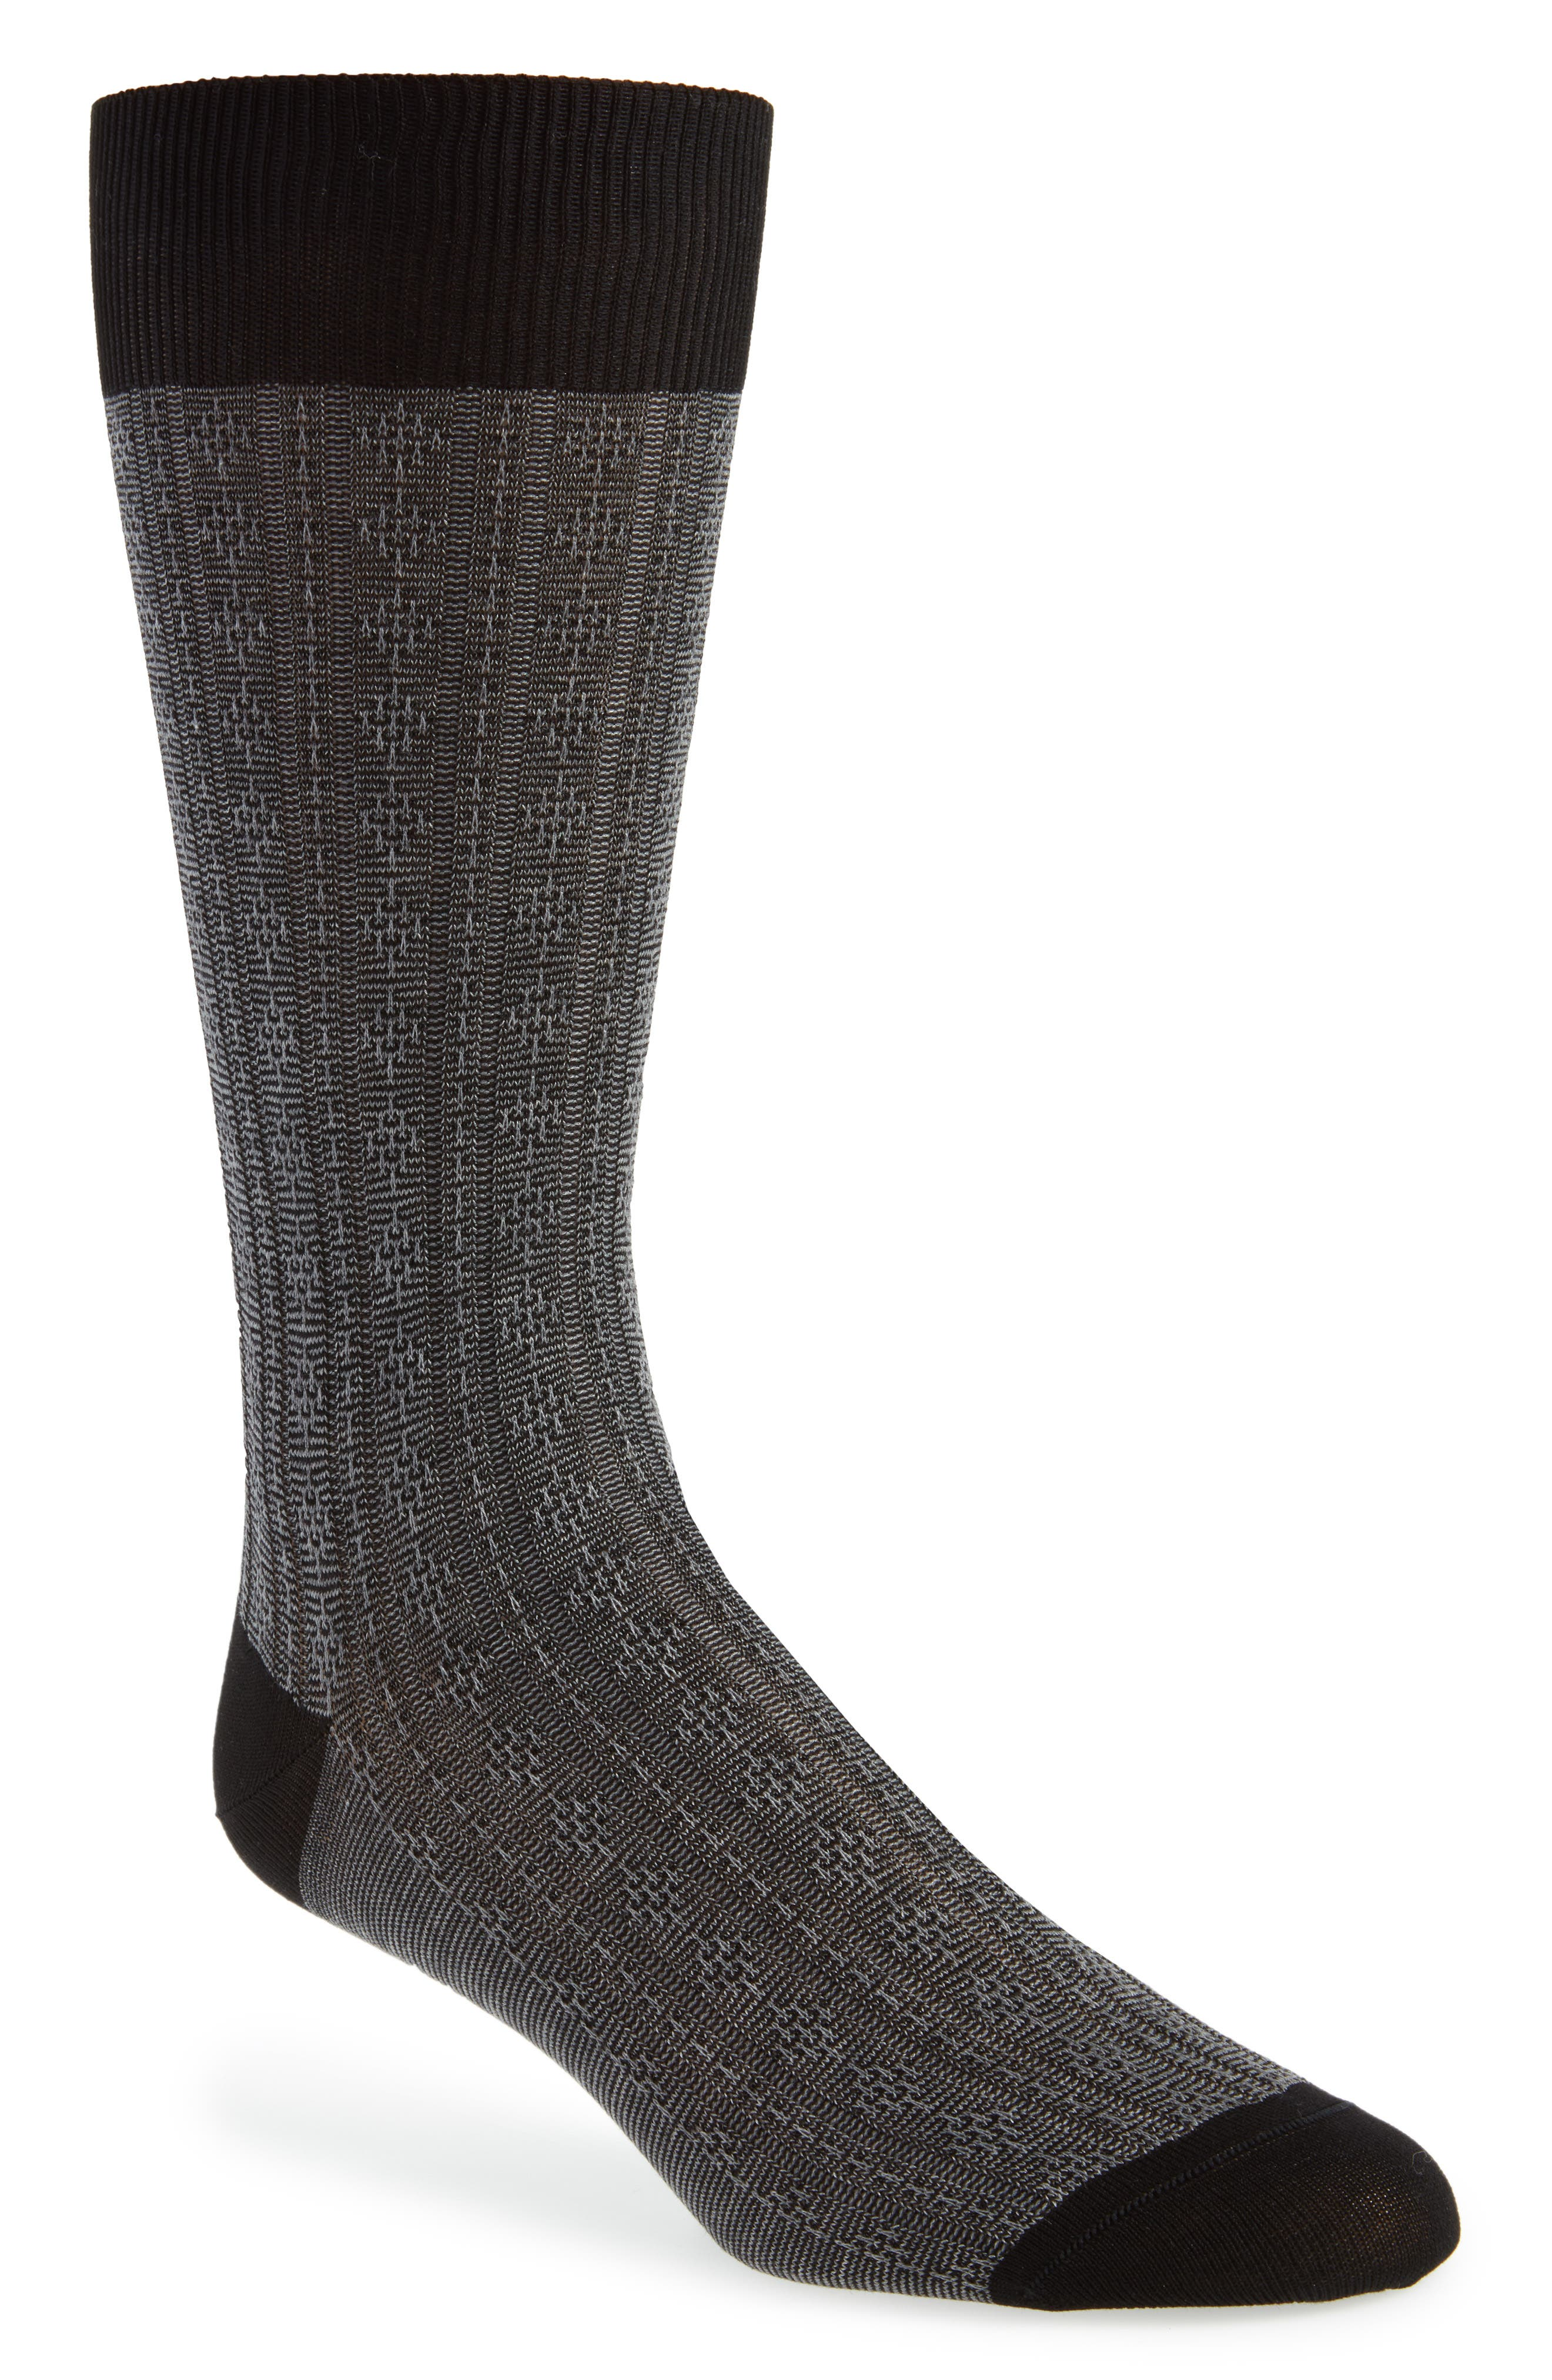 Atom Stitch Socks,                         Main,                         color, 001